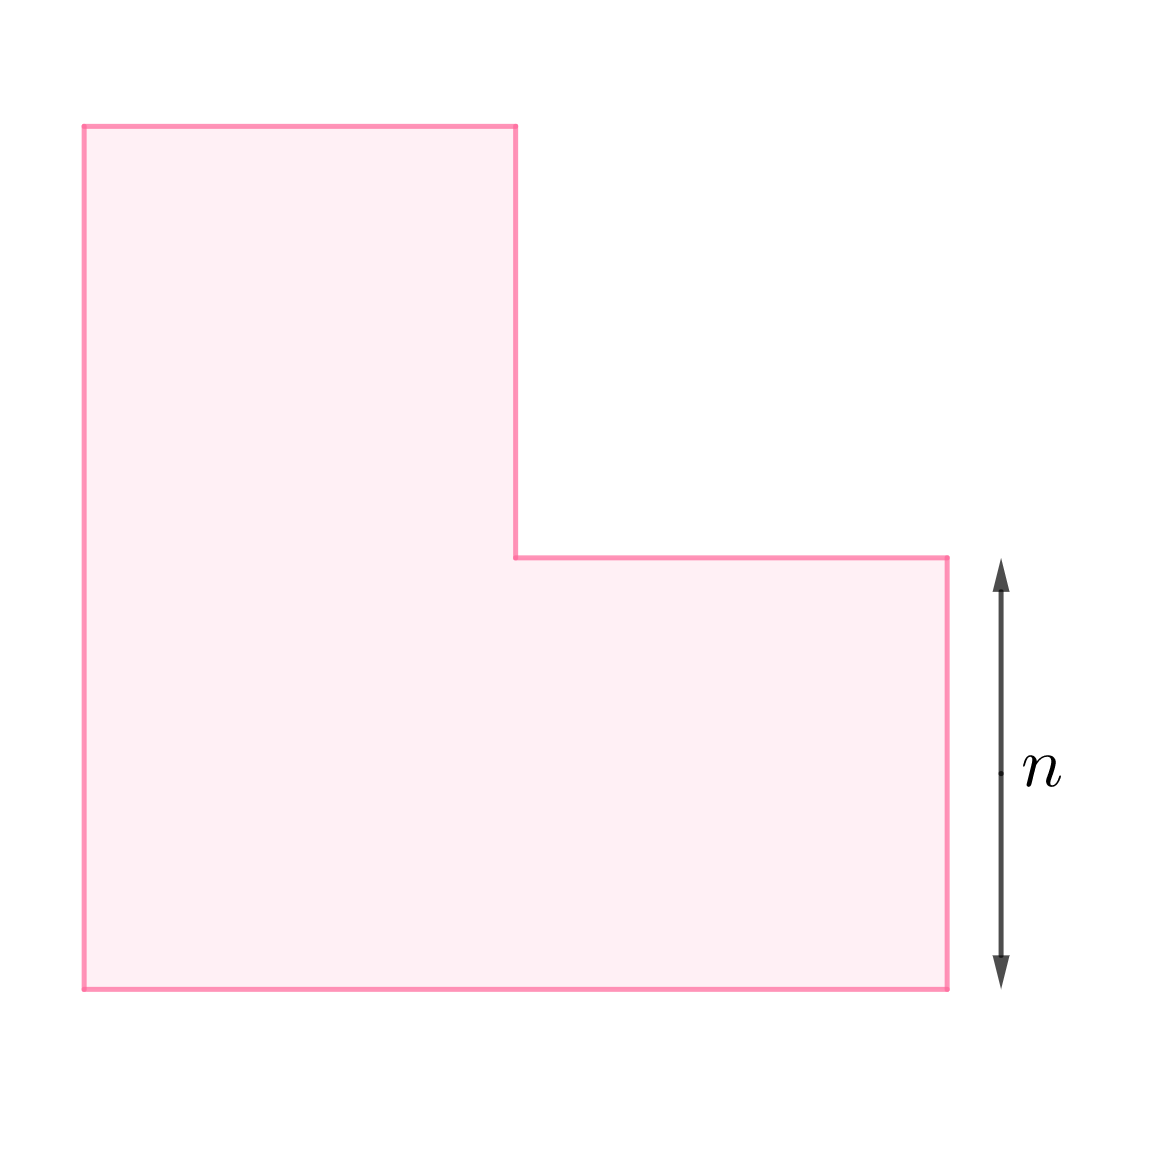 f:id:corollary2525:20190909224557p:plain